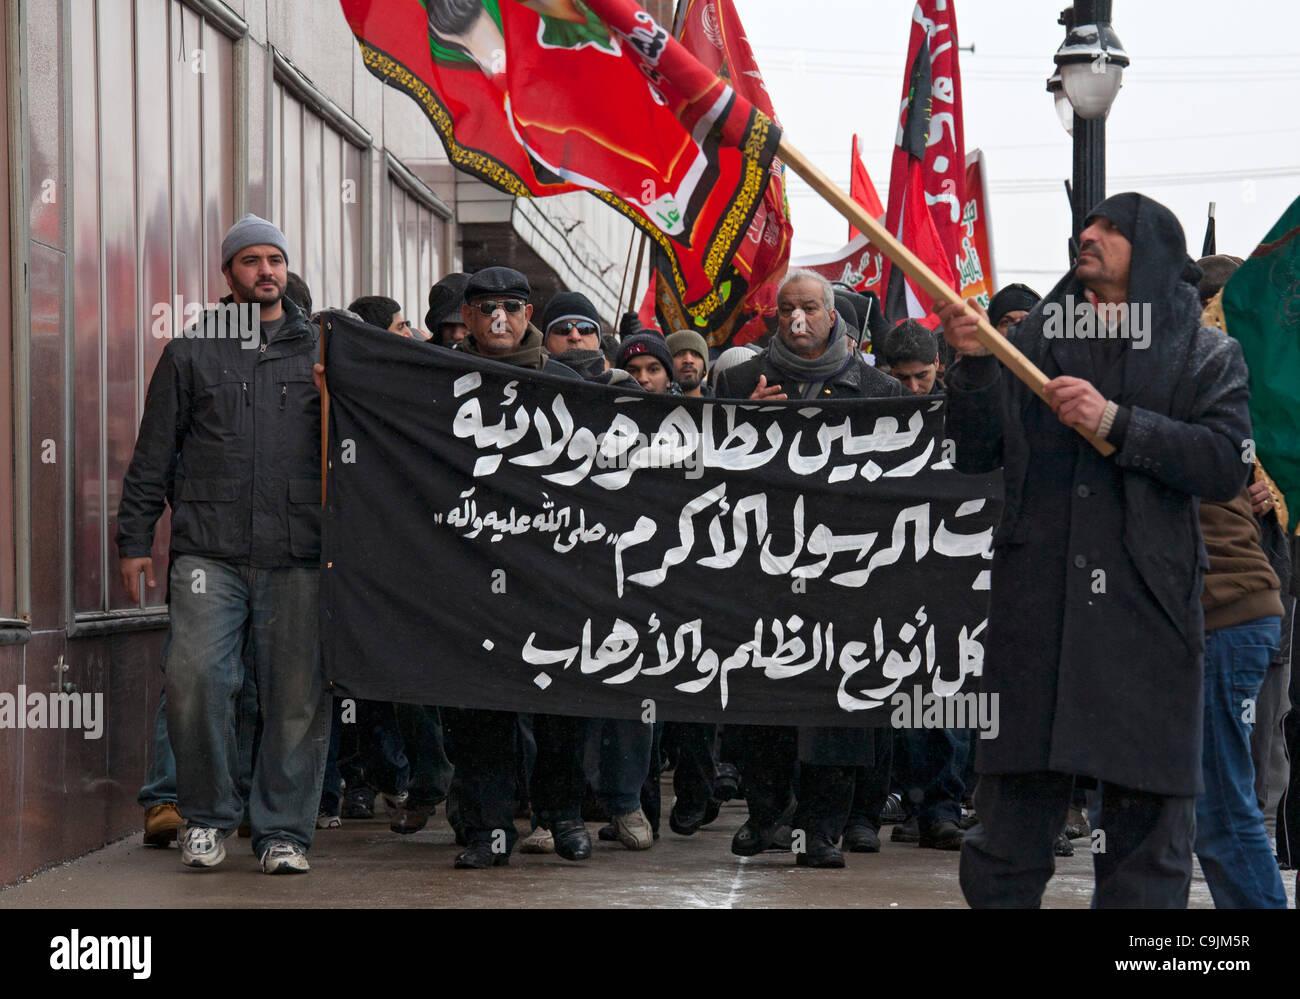 Muslims dearborn michigan